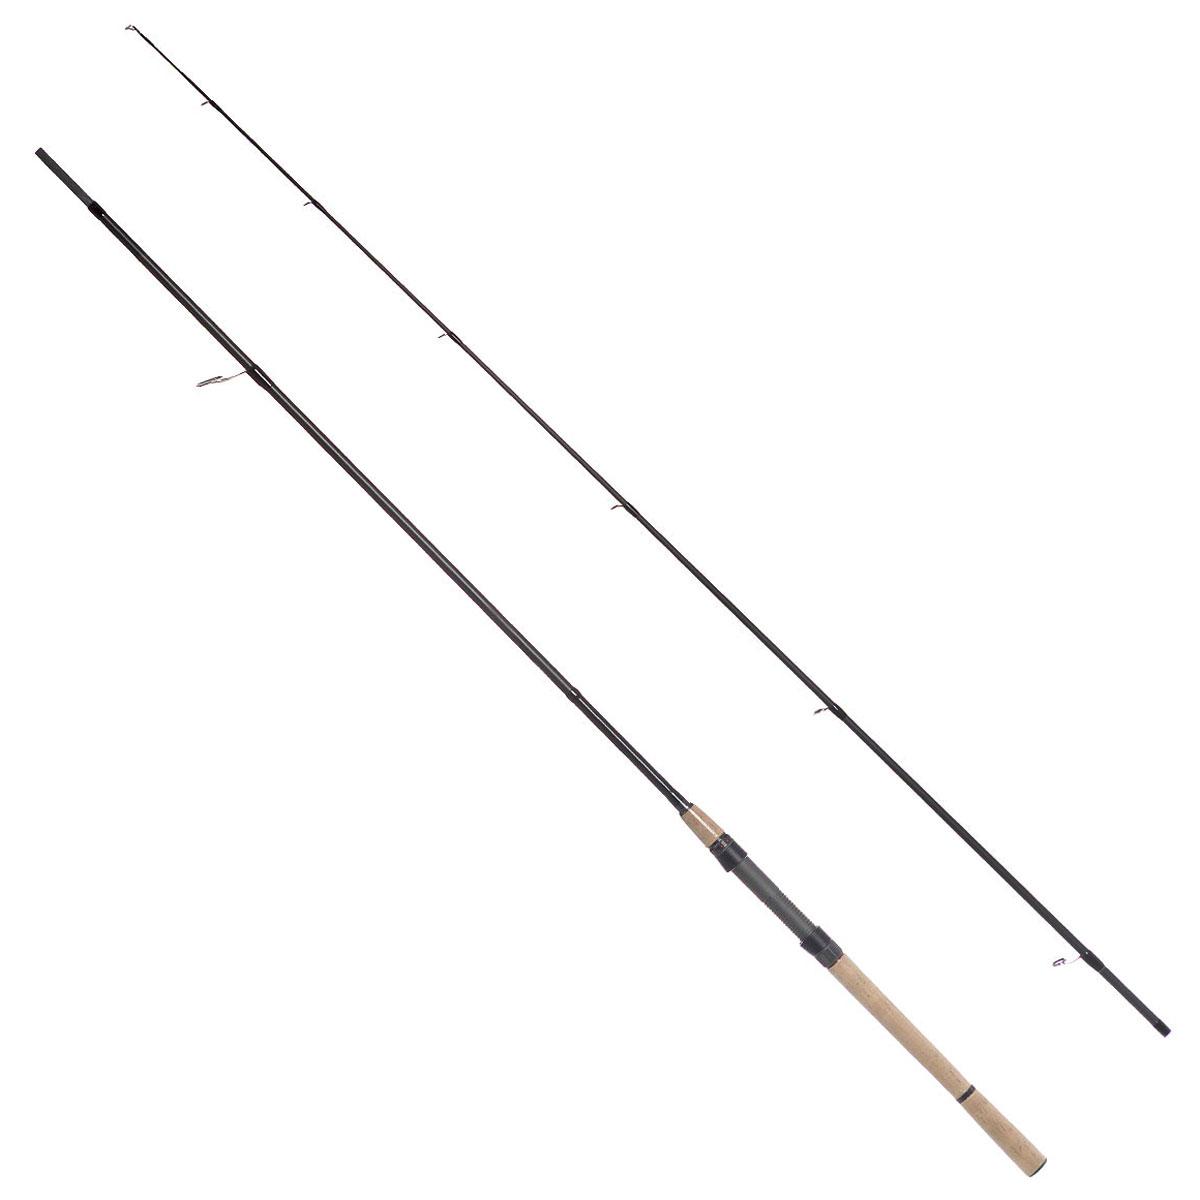 Спиннинг штекерный Daiwa Infinity-Q NEW Jigger, 2,40 м, 5-20 г